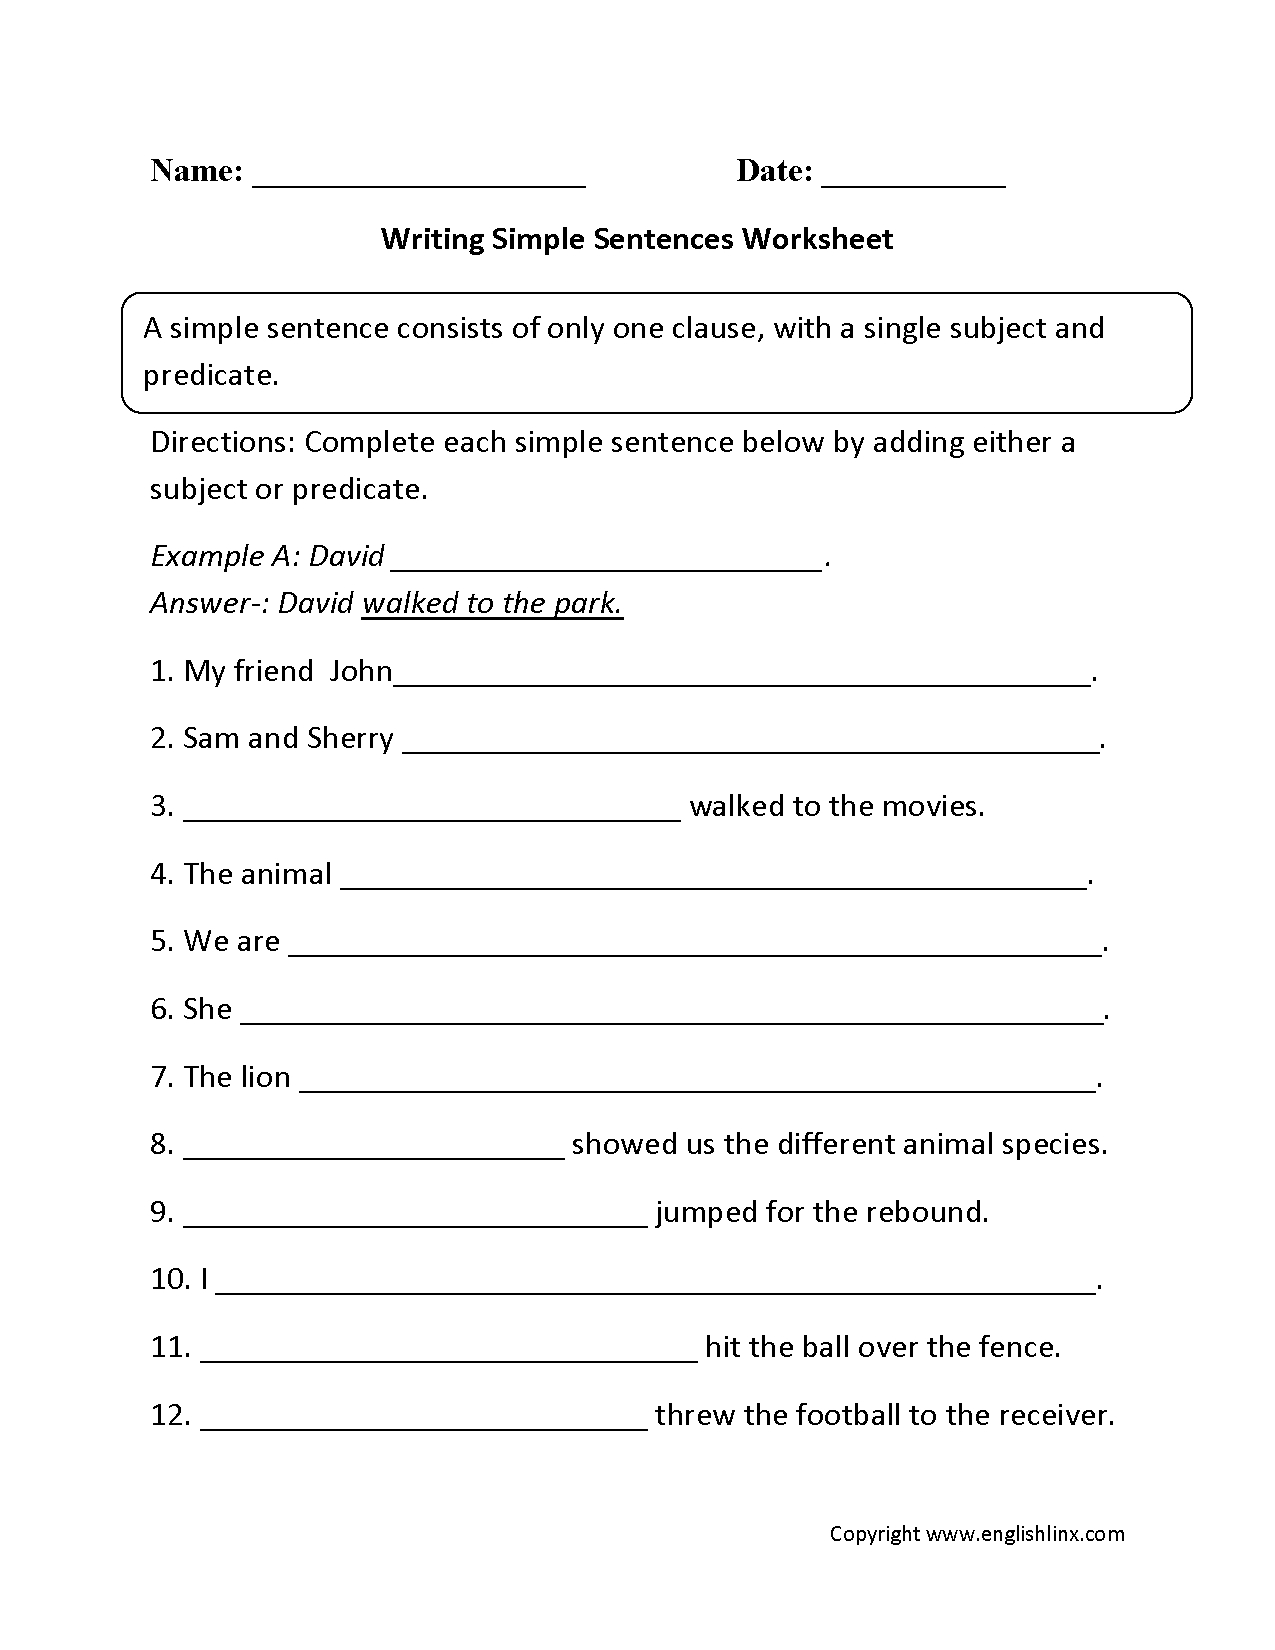 Sentences Worksheets | Simple Sentences Worksheets | 7Th Grade Writing Worksheets Printable